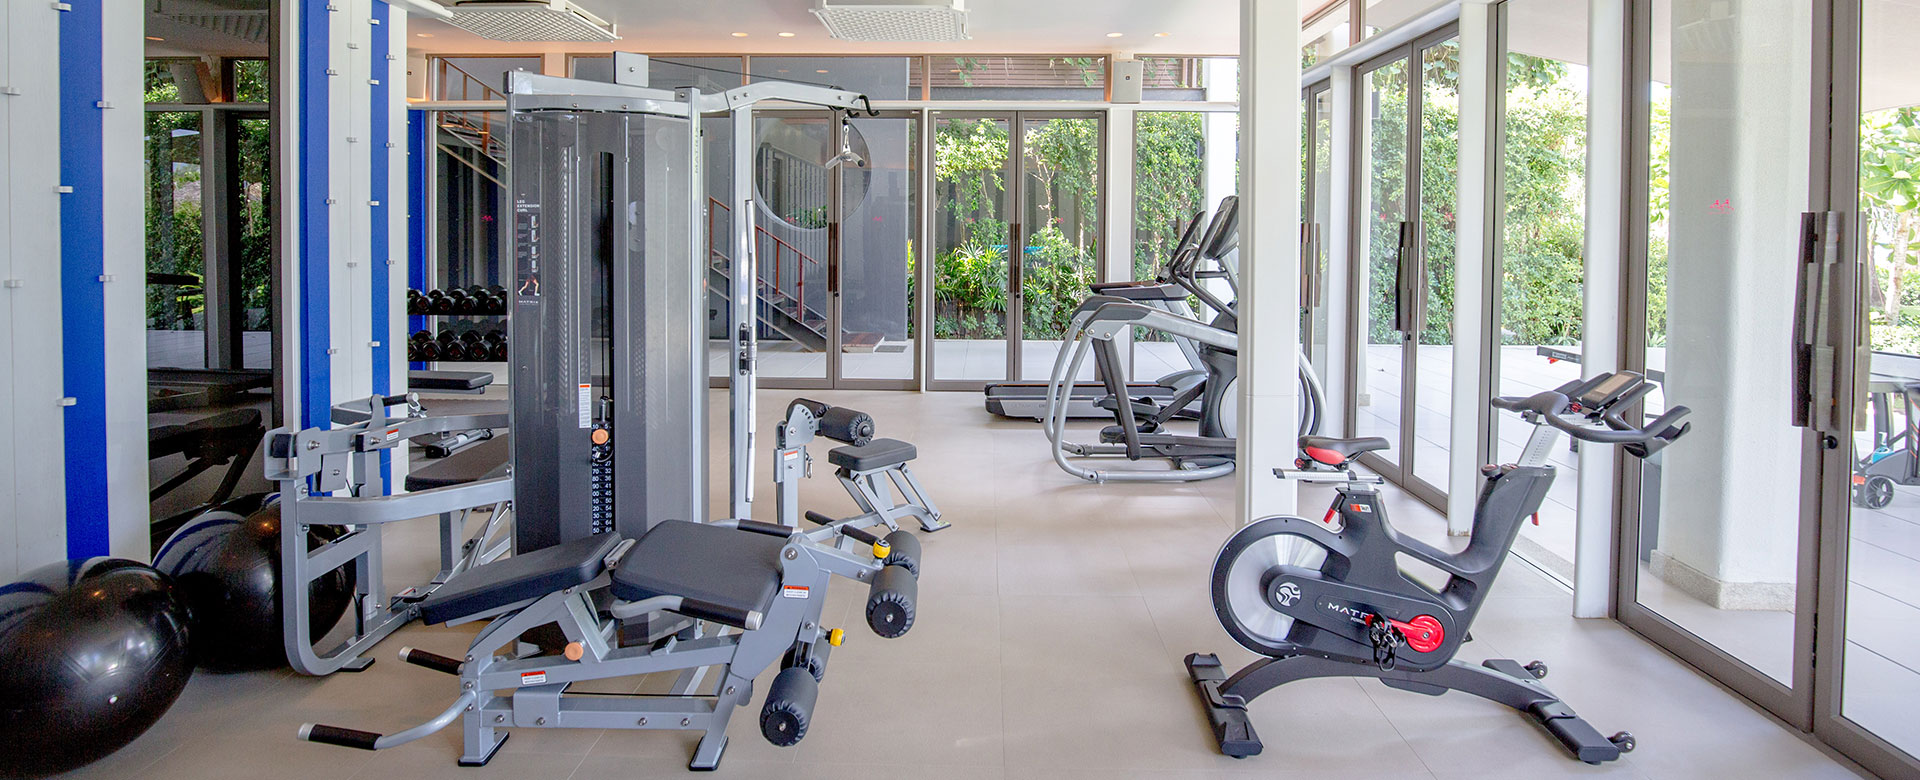 18-Facilities-Baba-Beach-Club-Luxury-Hotel-Phuket-by-Sri-Panwa